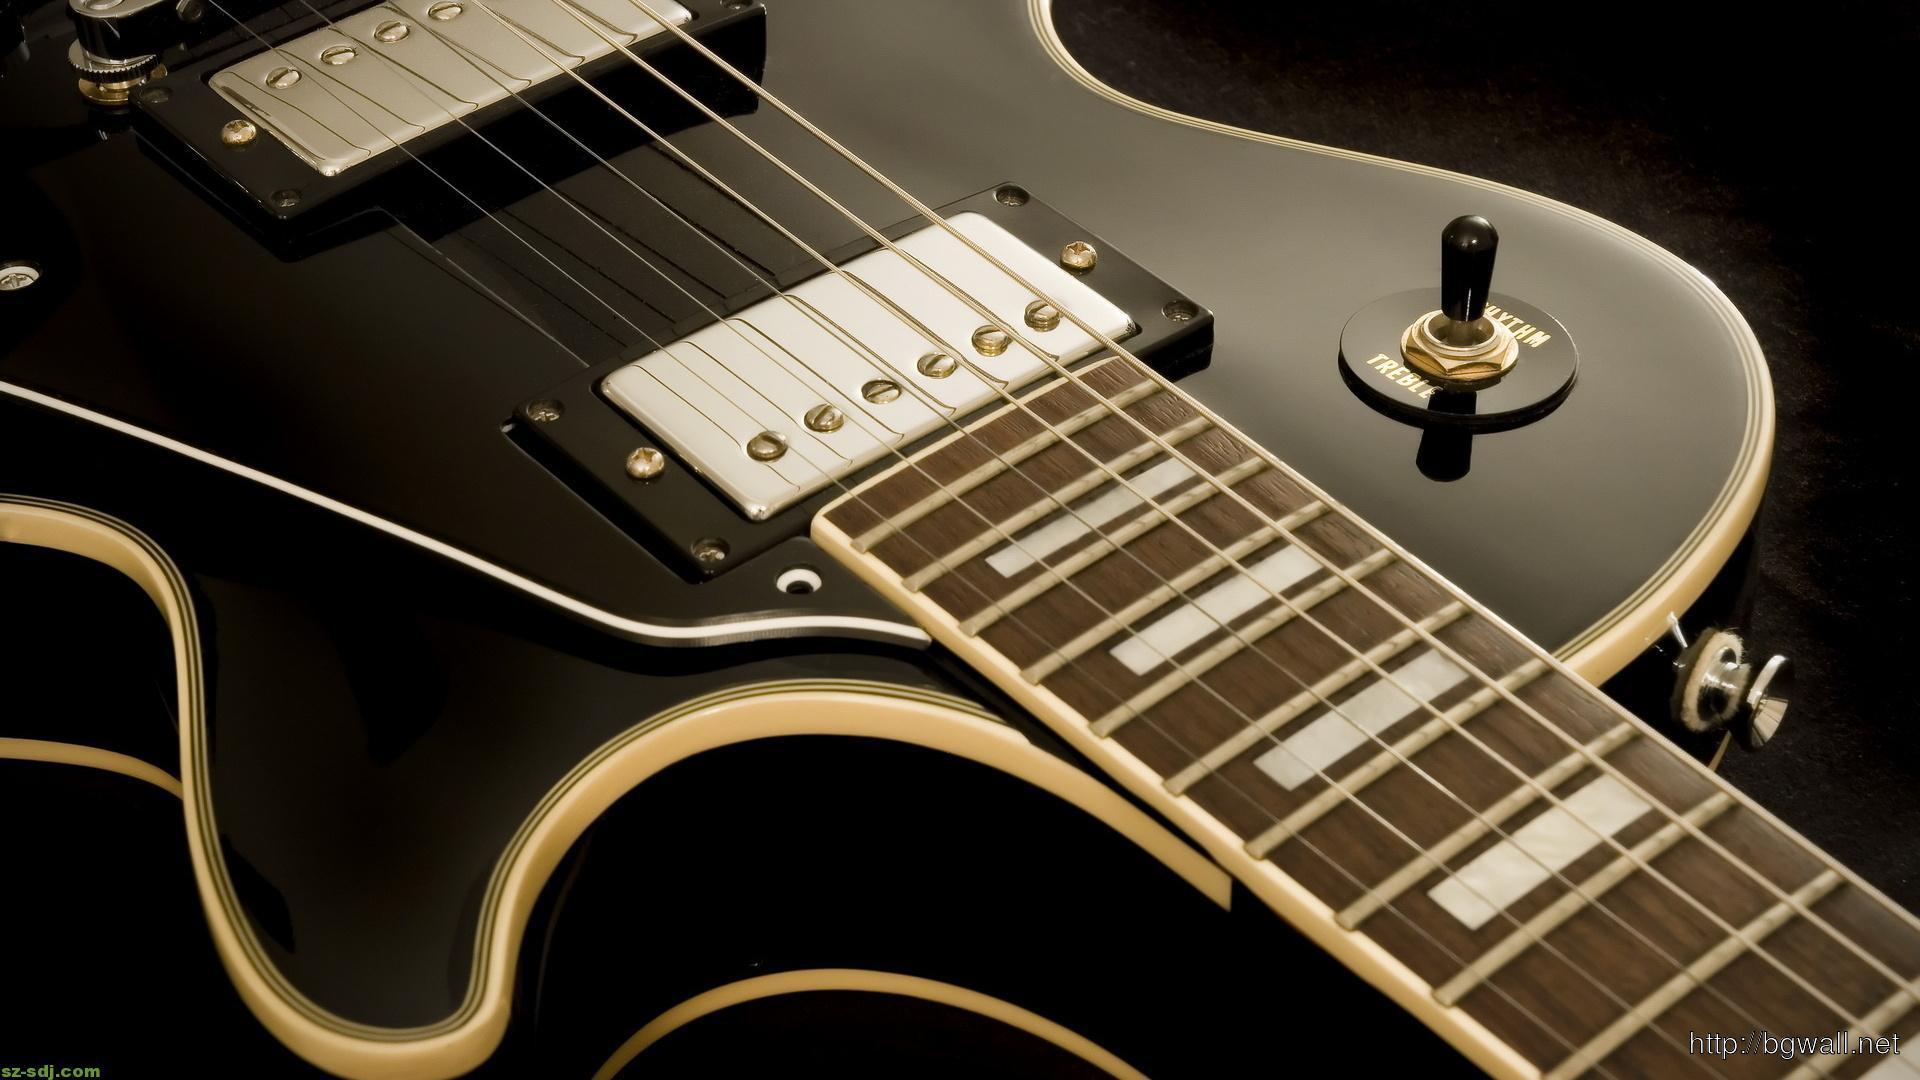 Fender Guitar Music Wallpaper Desktop Hd